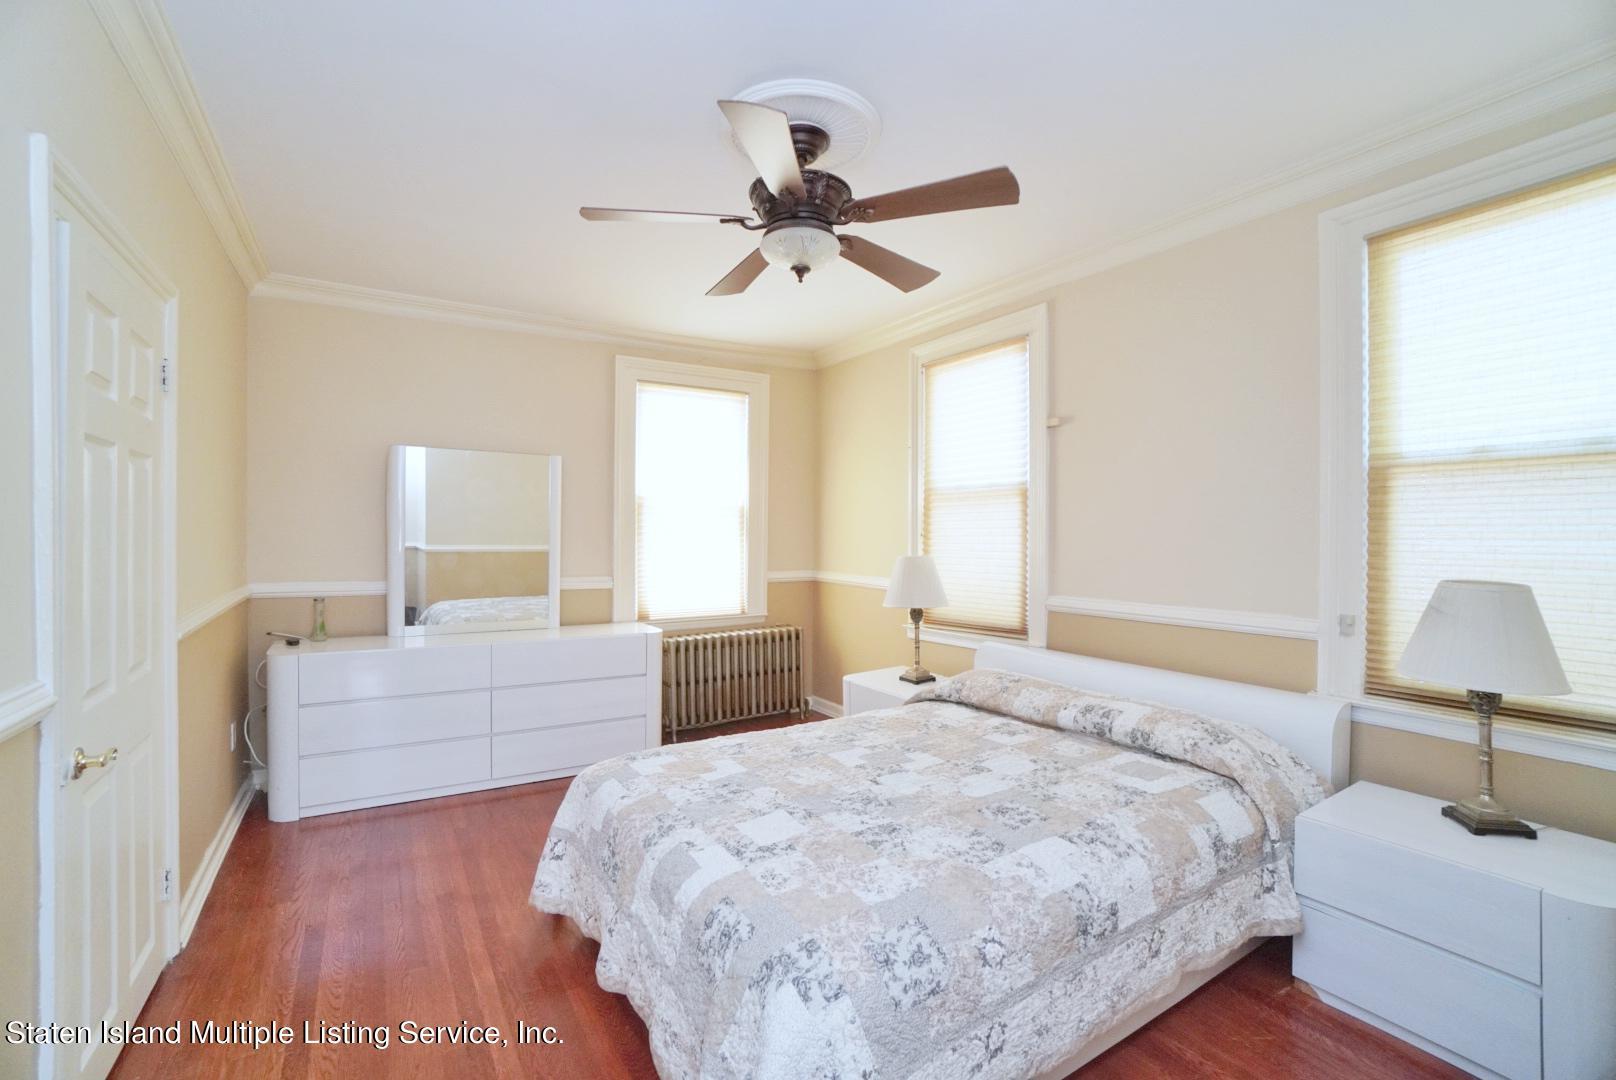 Single Family - Detached 264 Fisher Avenue  Staten Island, NY 10307, MLS-1146898-35